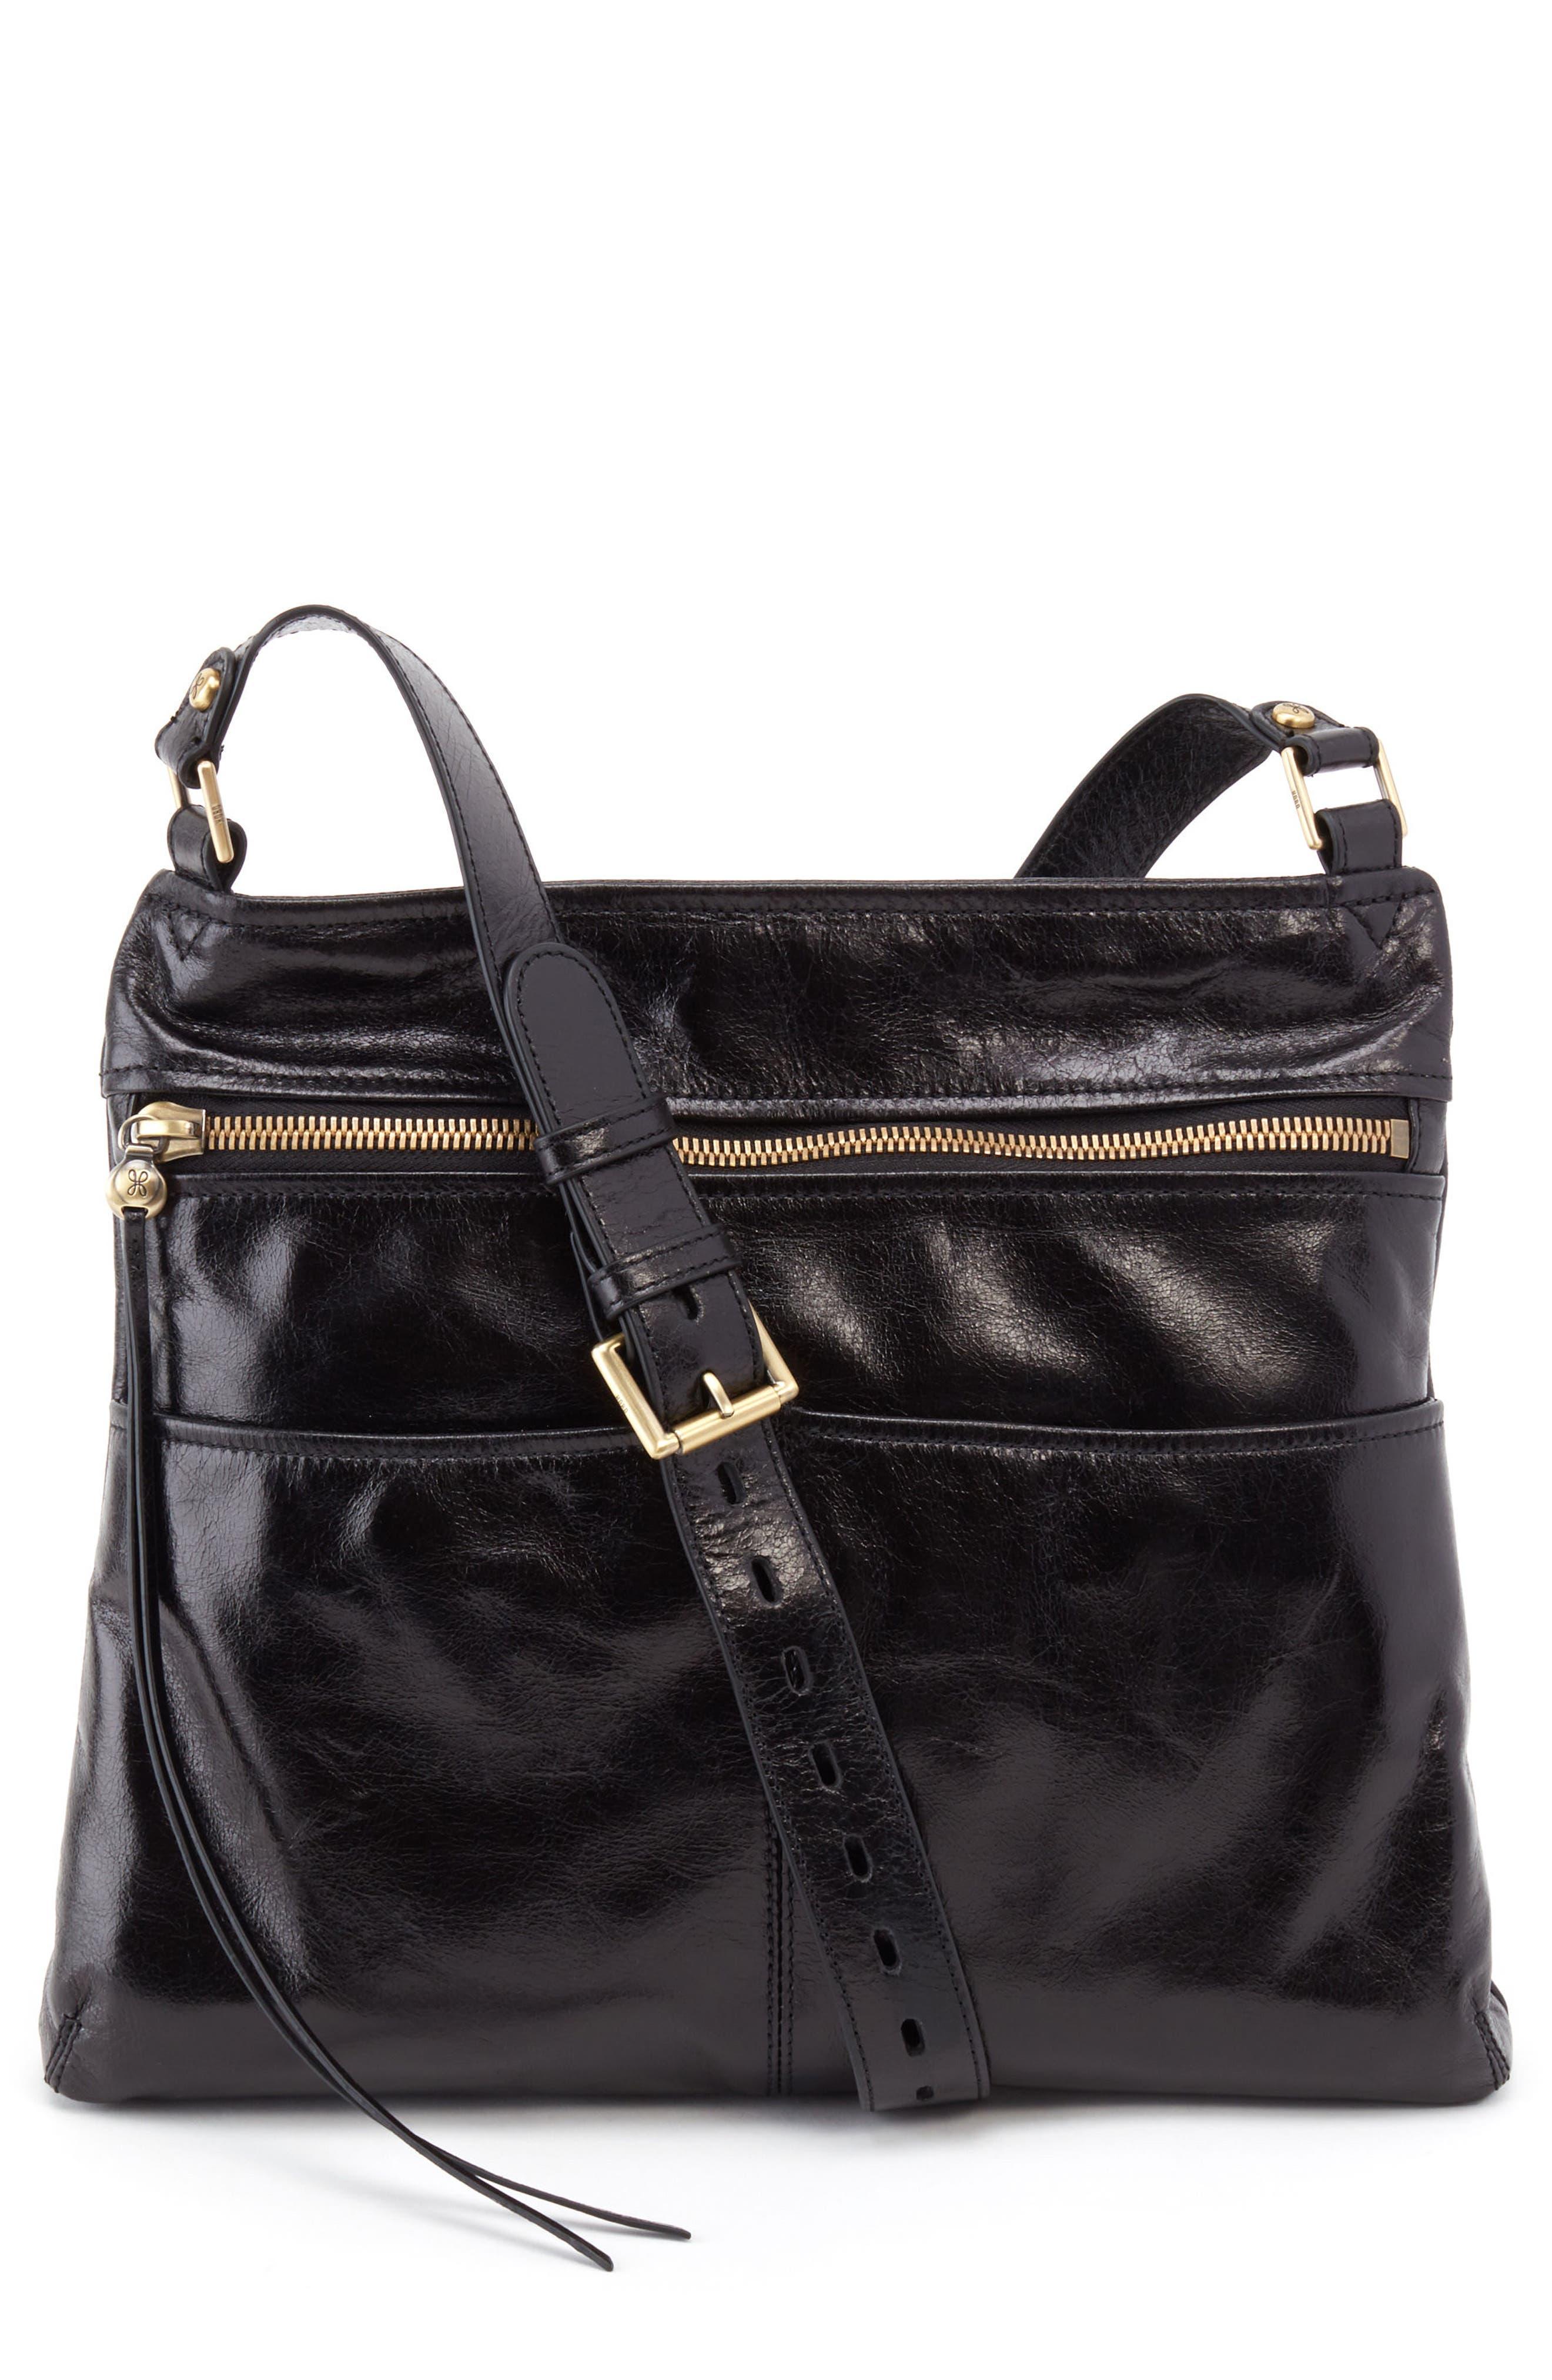 Angler Crossbody Bag,                             Main thumbnail 1, color,                             BLACK